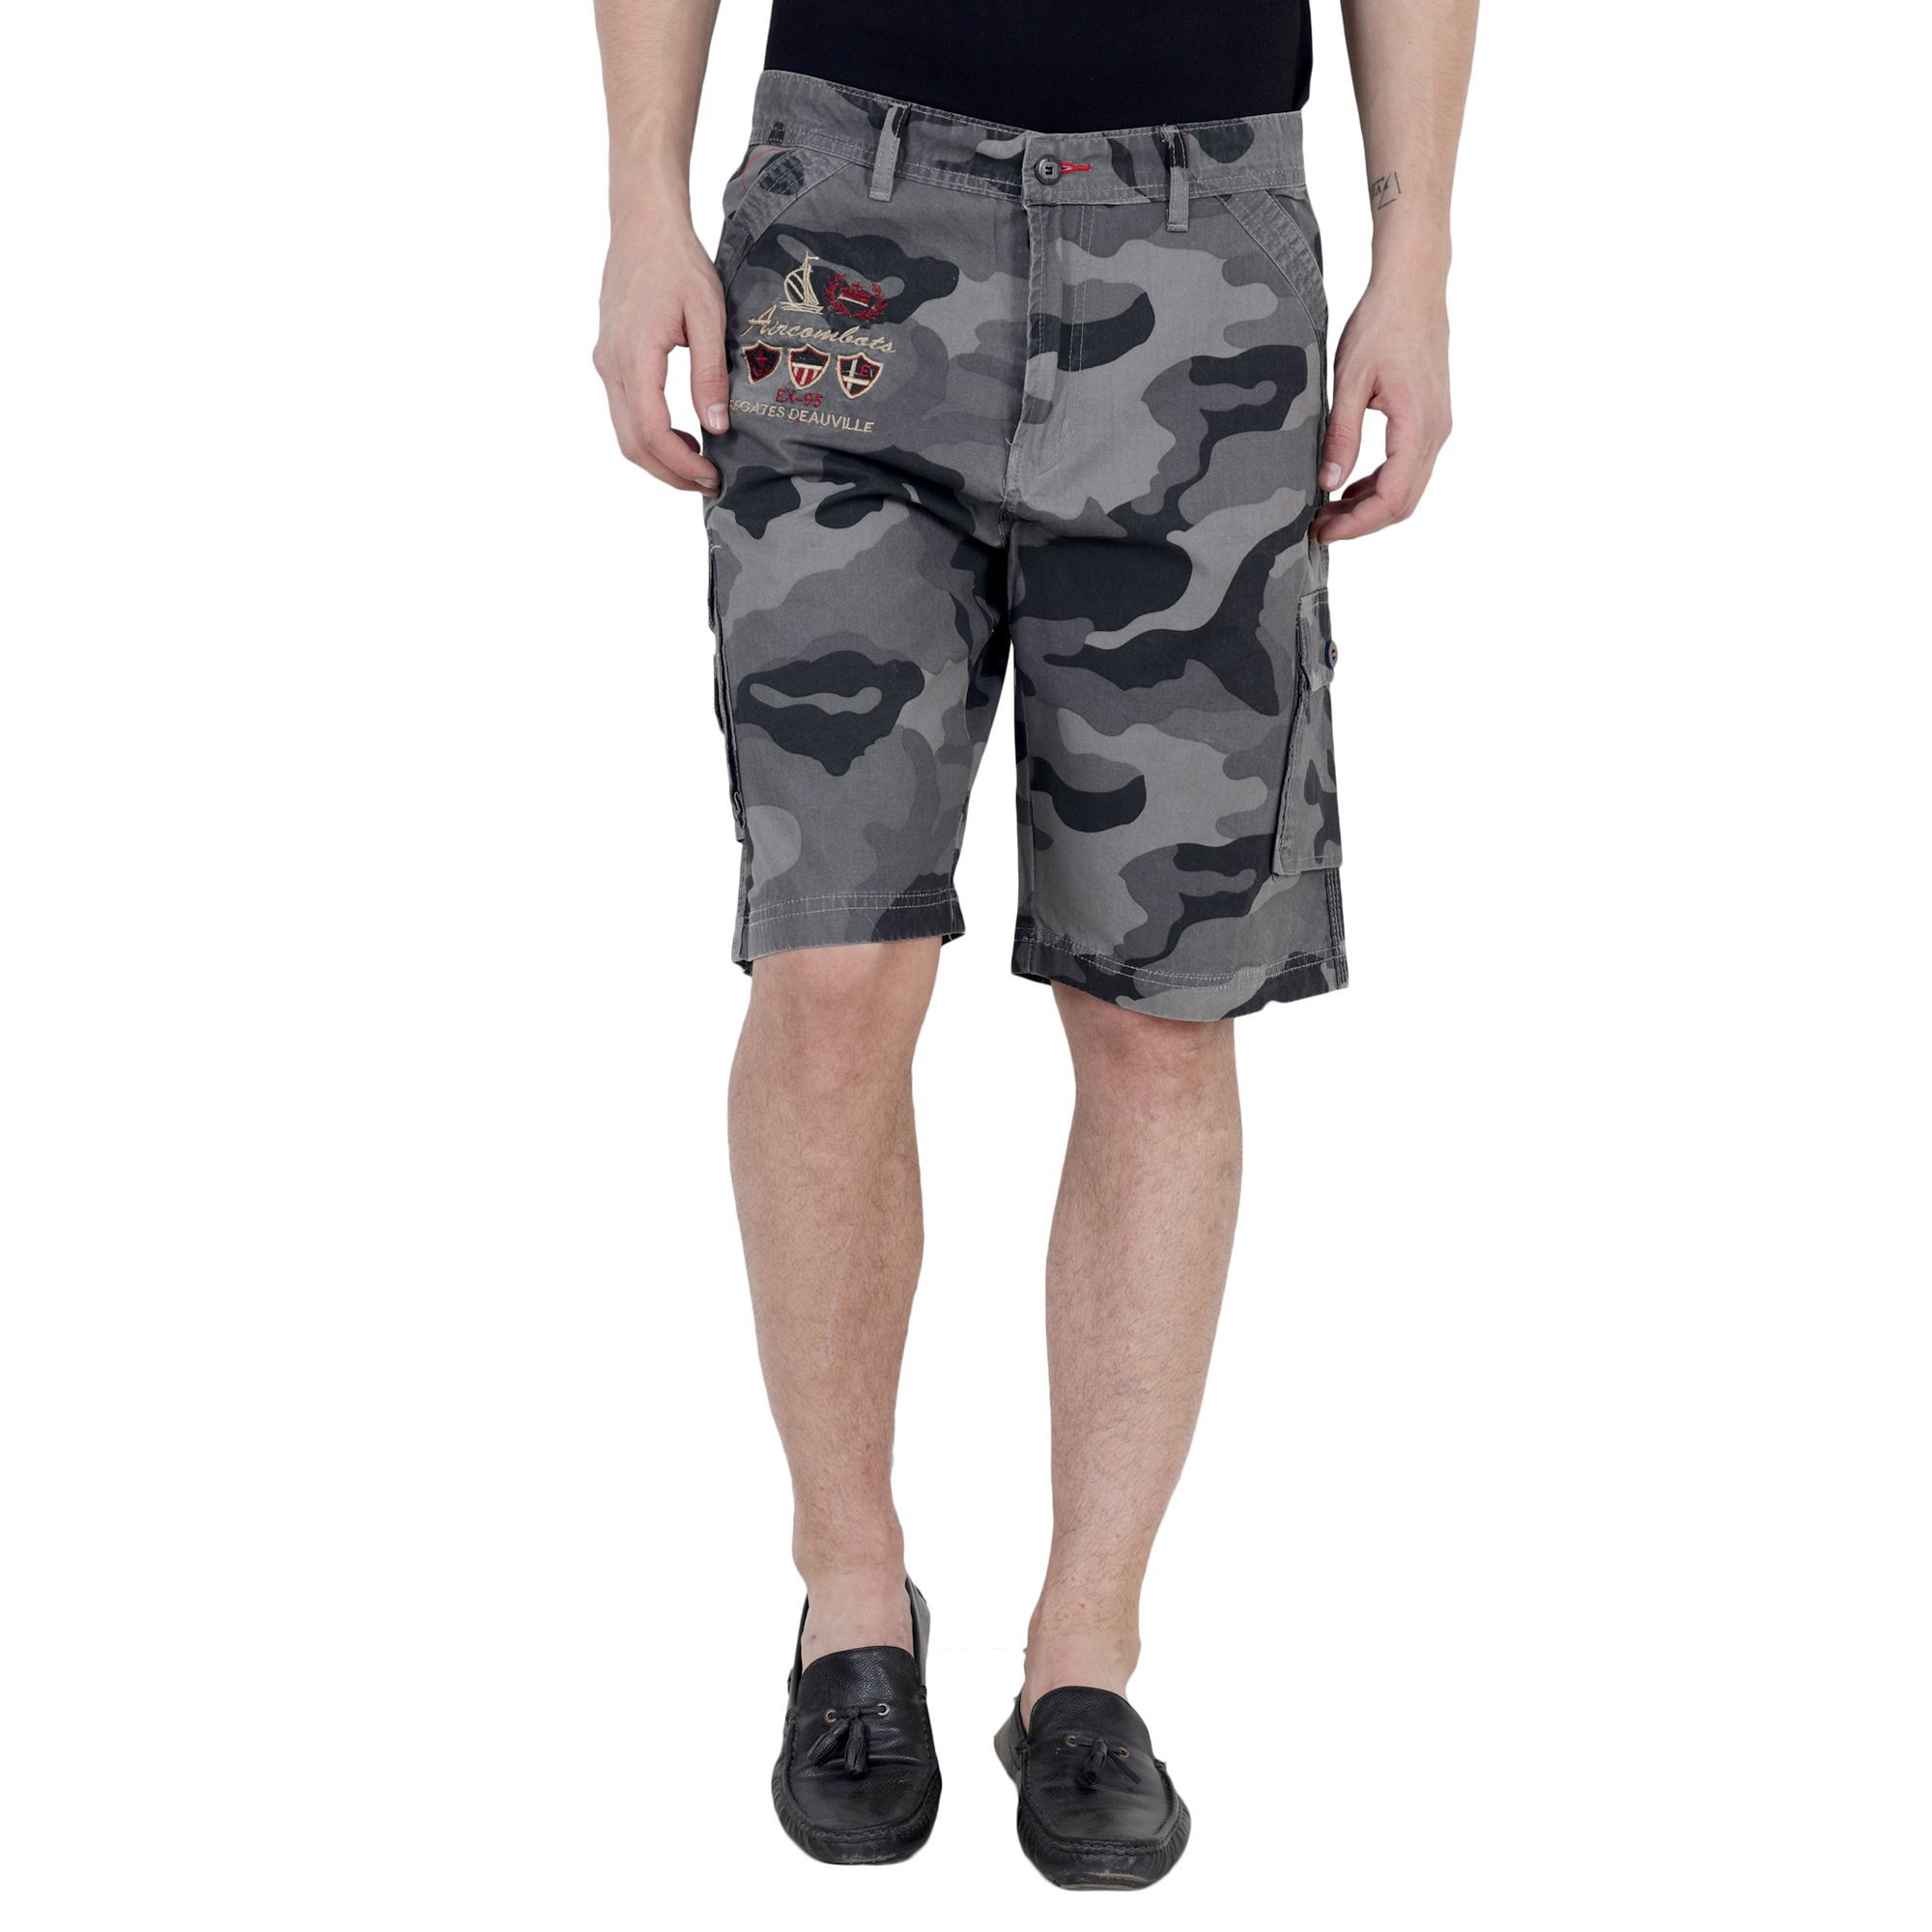 King Size Grey Shorts